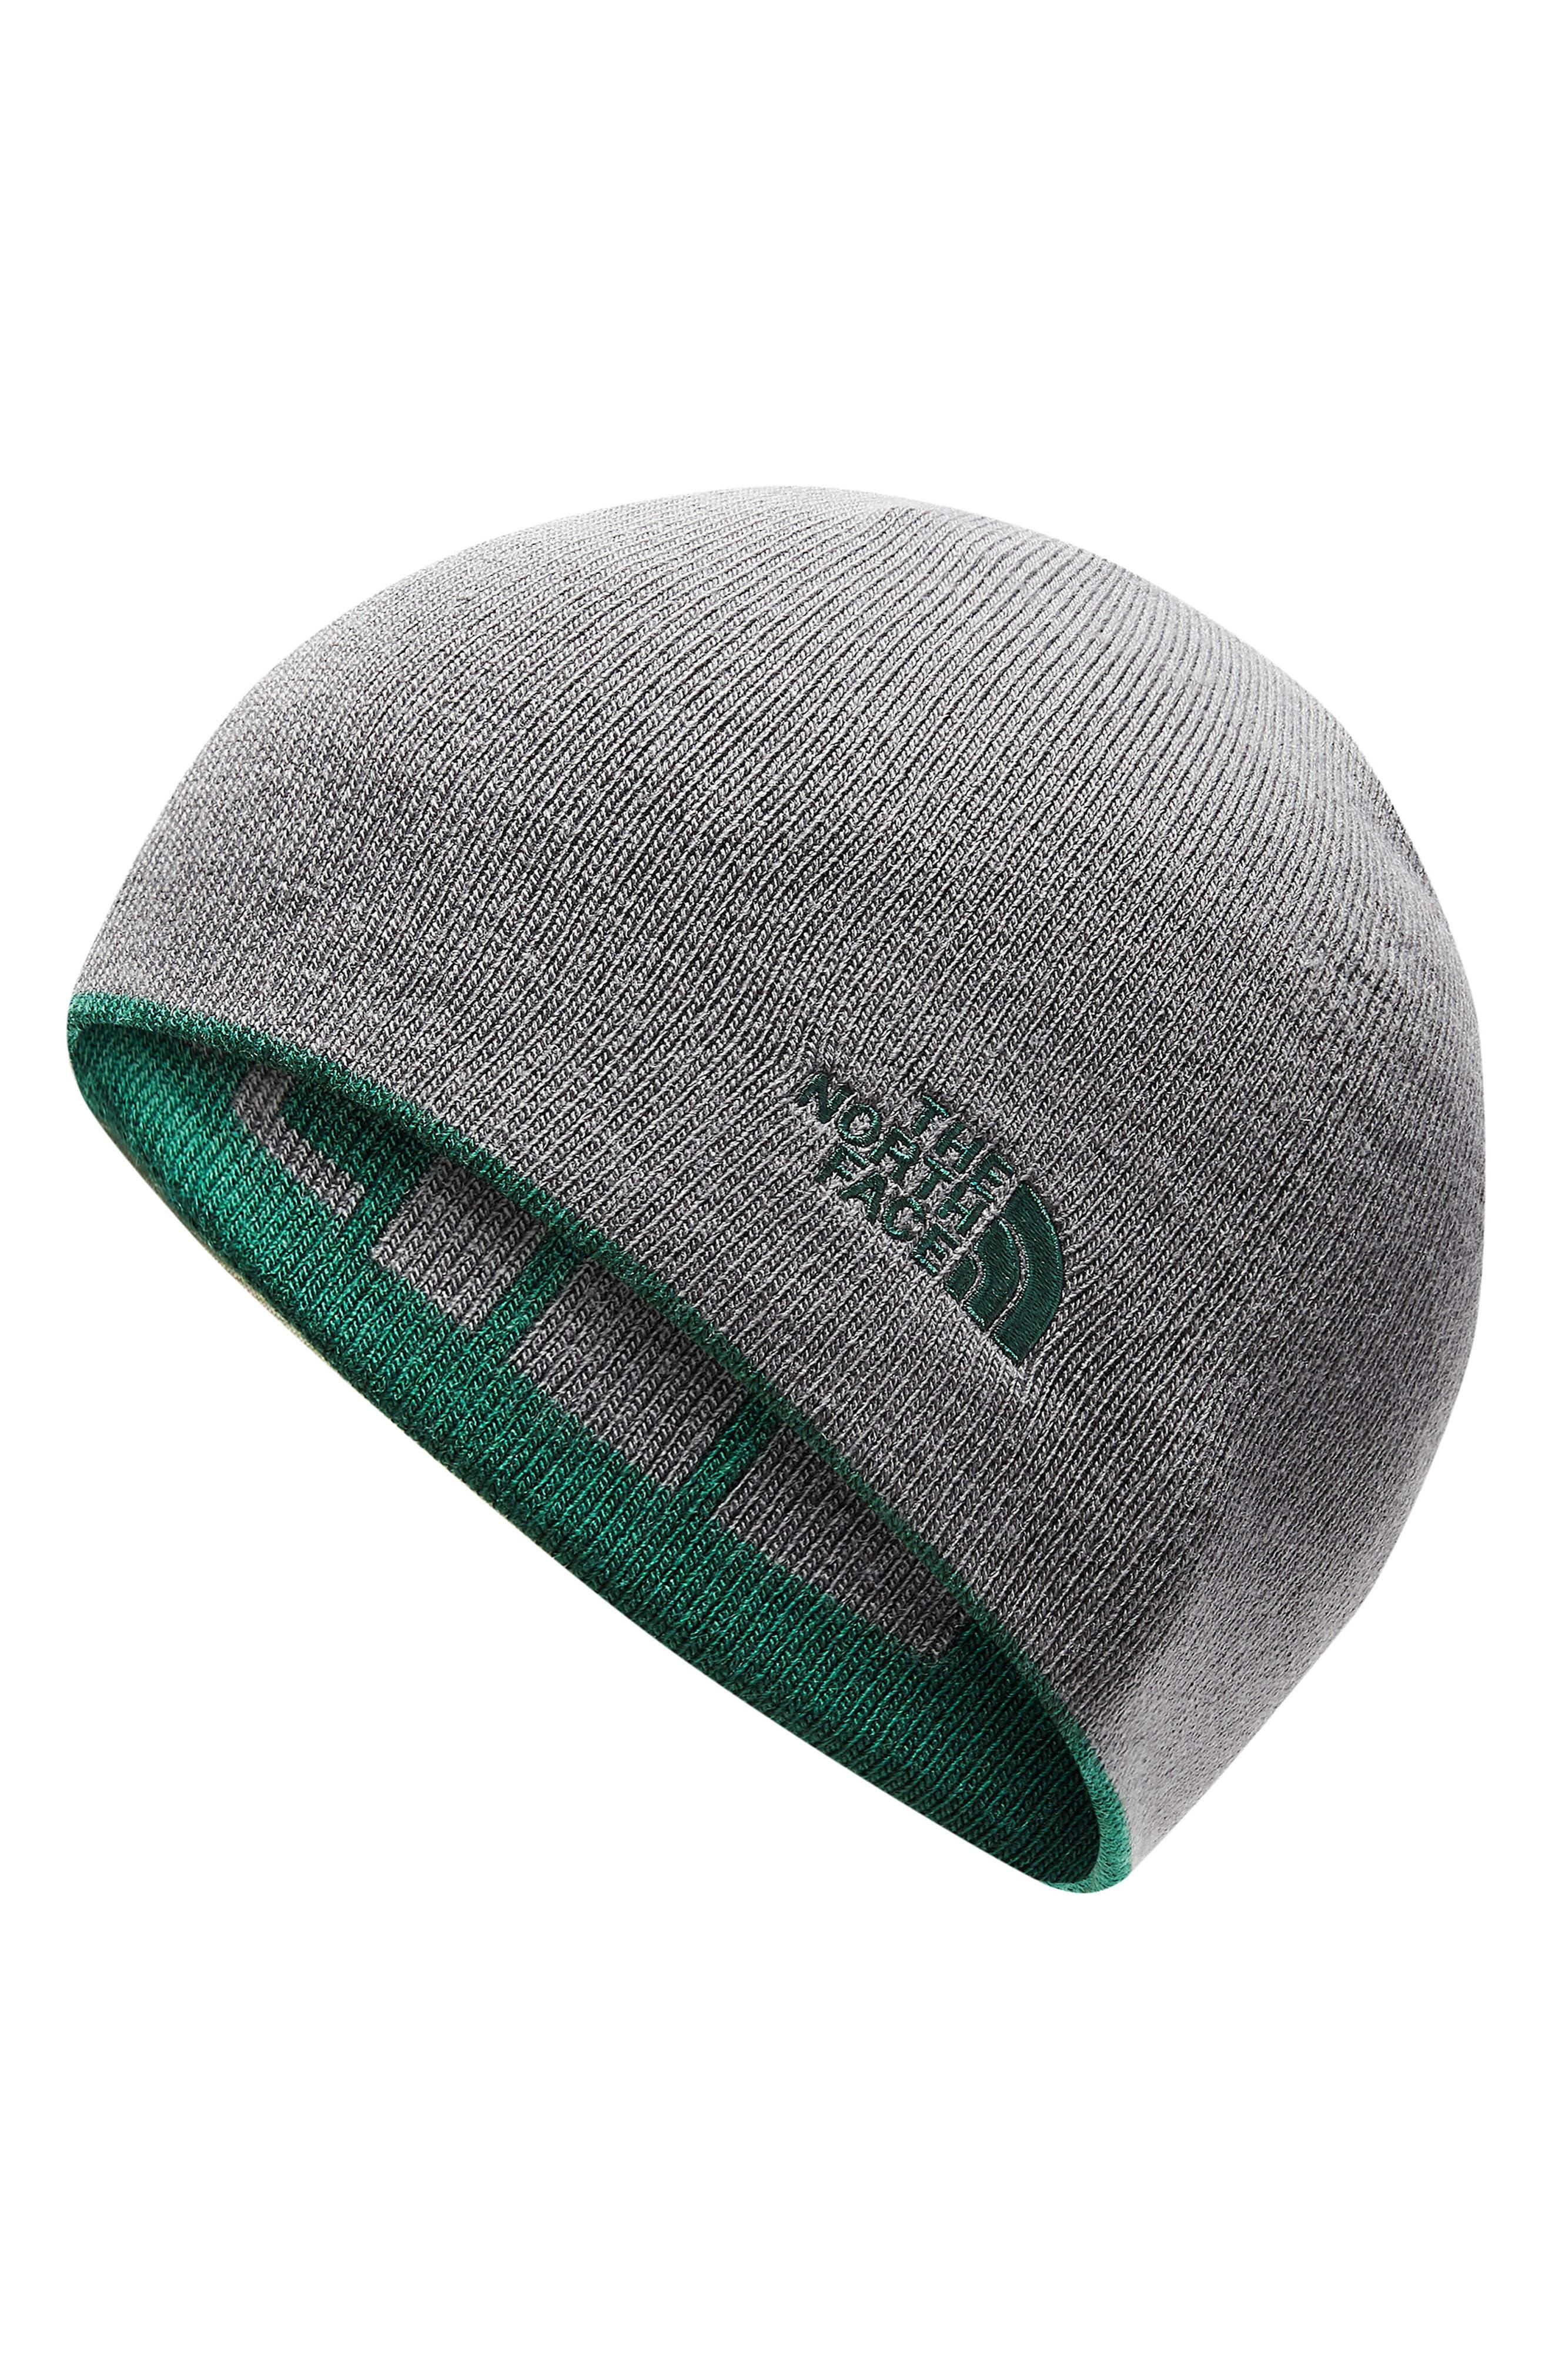 ... new product Mens Beanies Knit Caps Winter Hats Nordstrom 1c4b1 1b228 ... c6c9b11a0ec